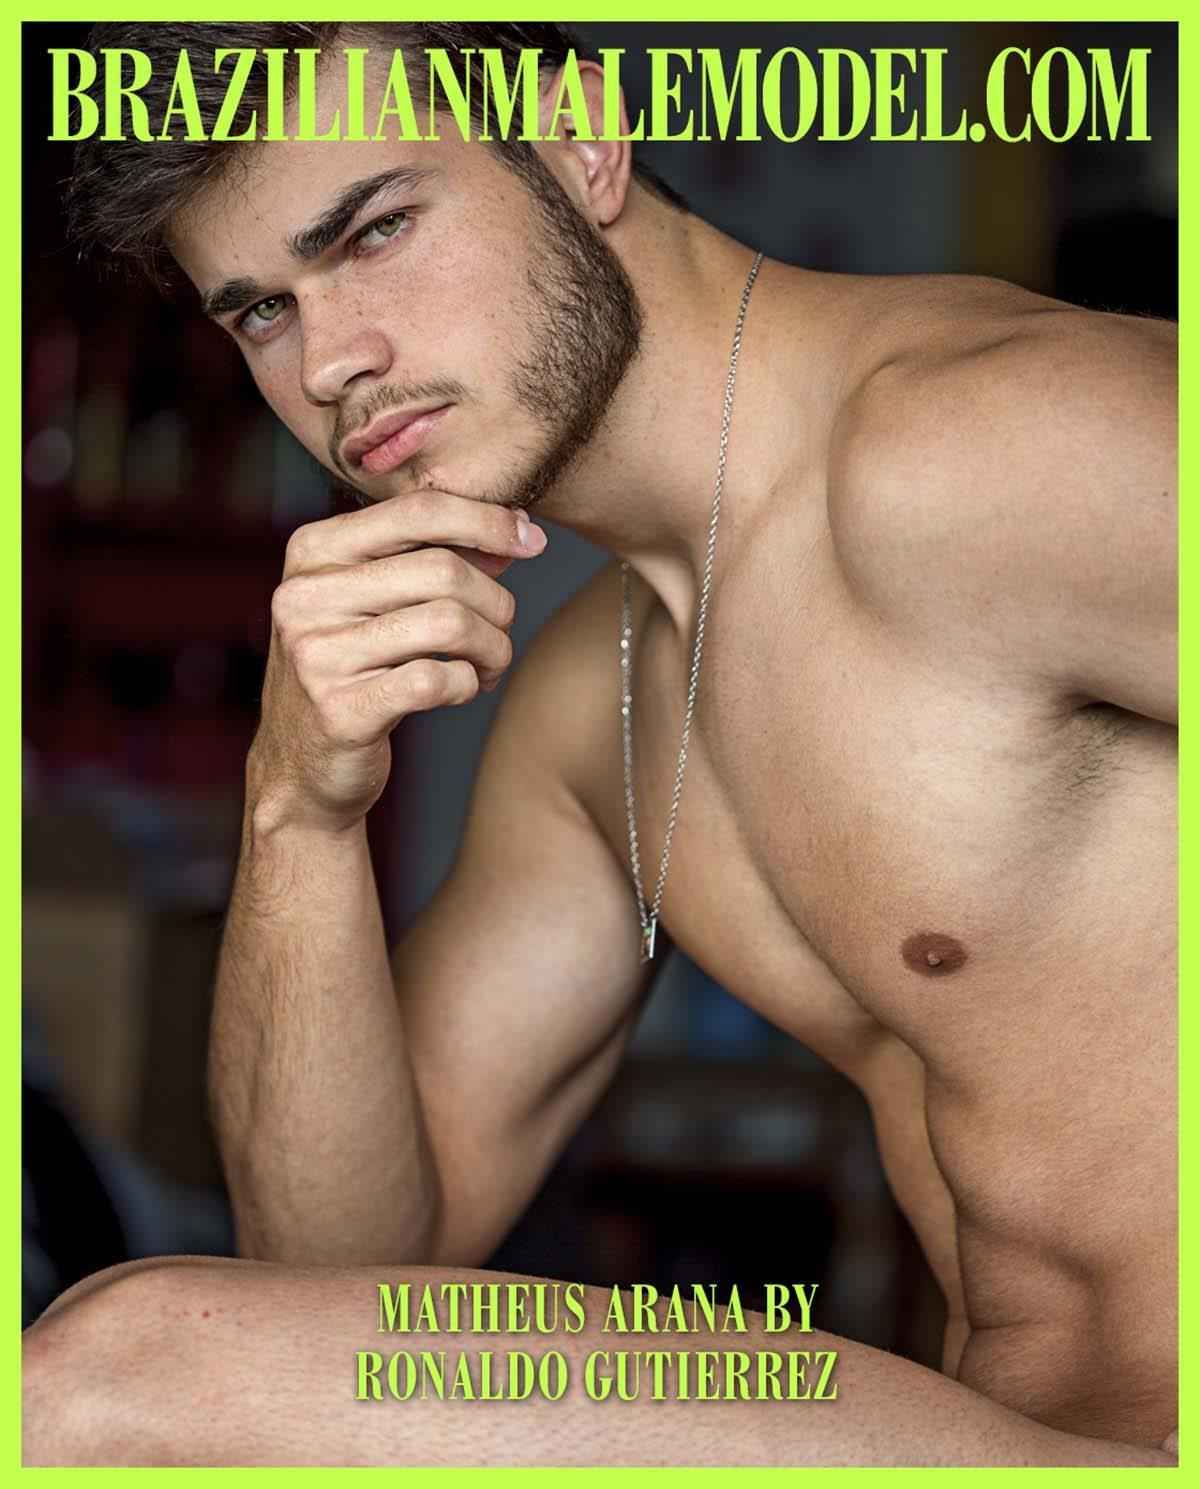 Matheus Arana by Ronaldo Gutierrez